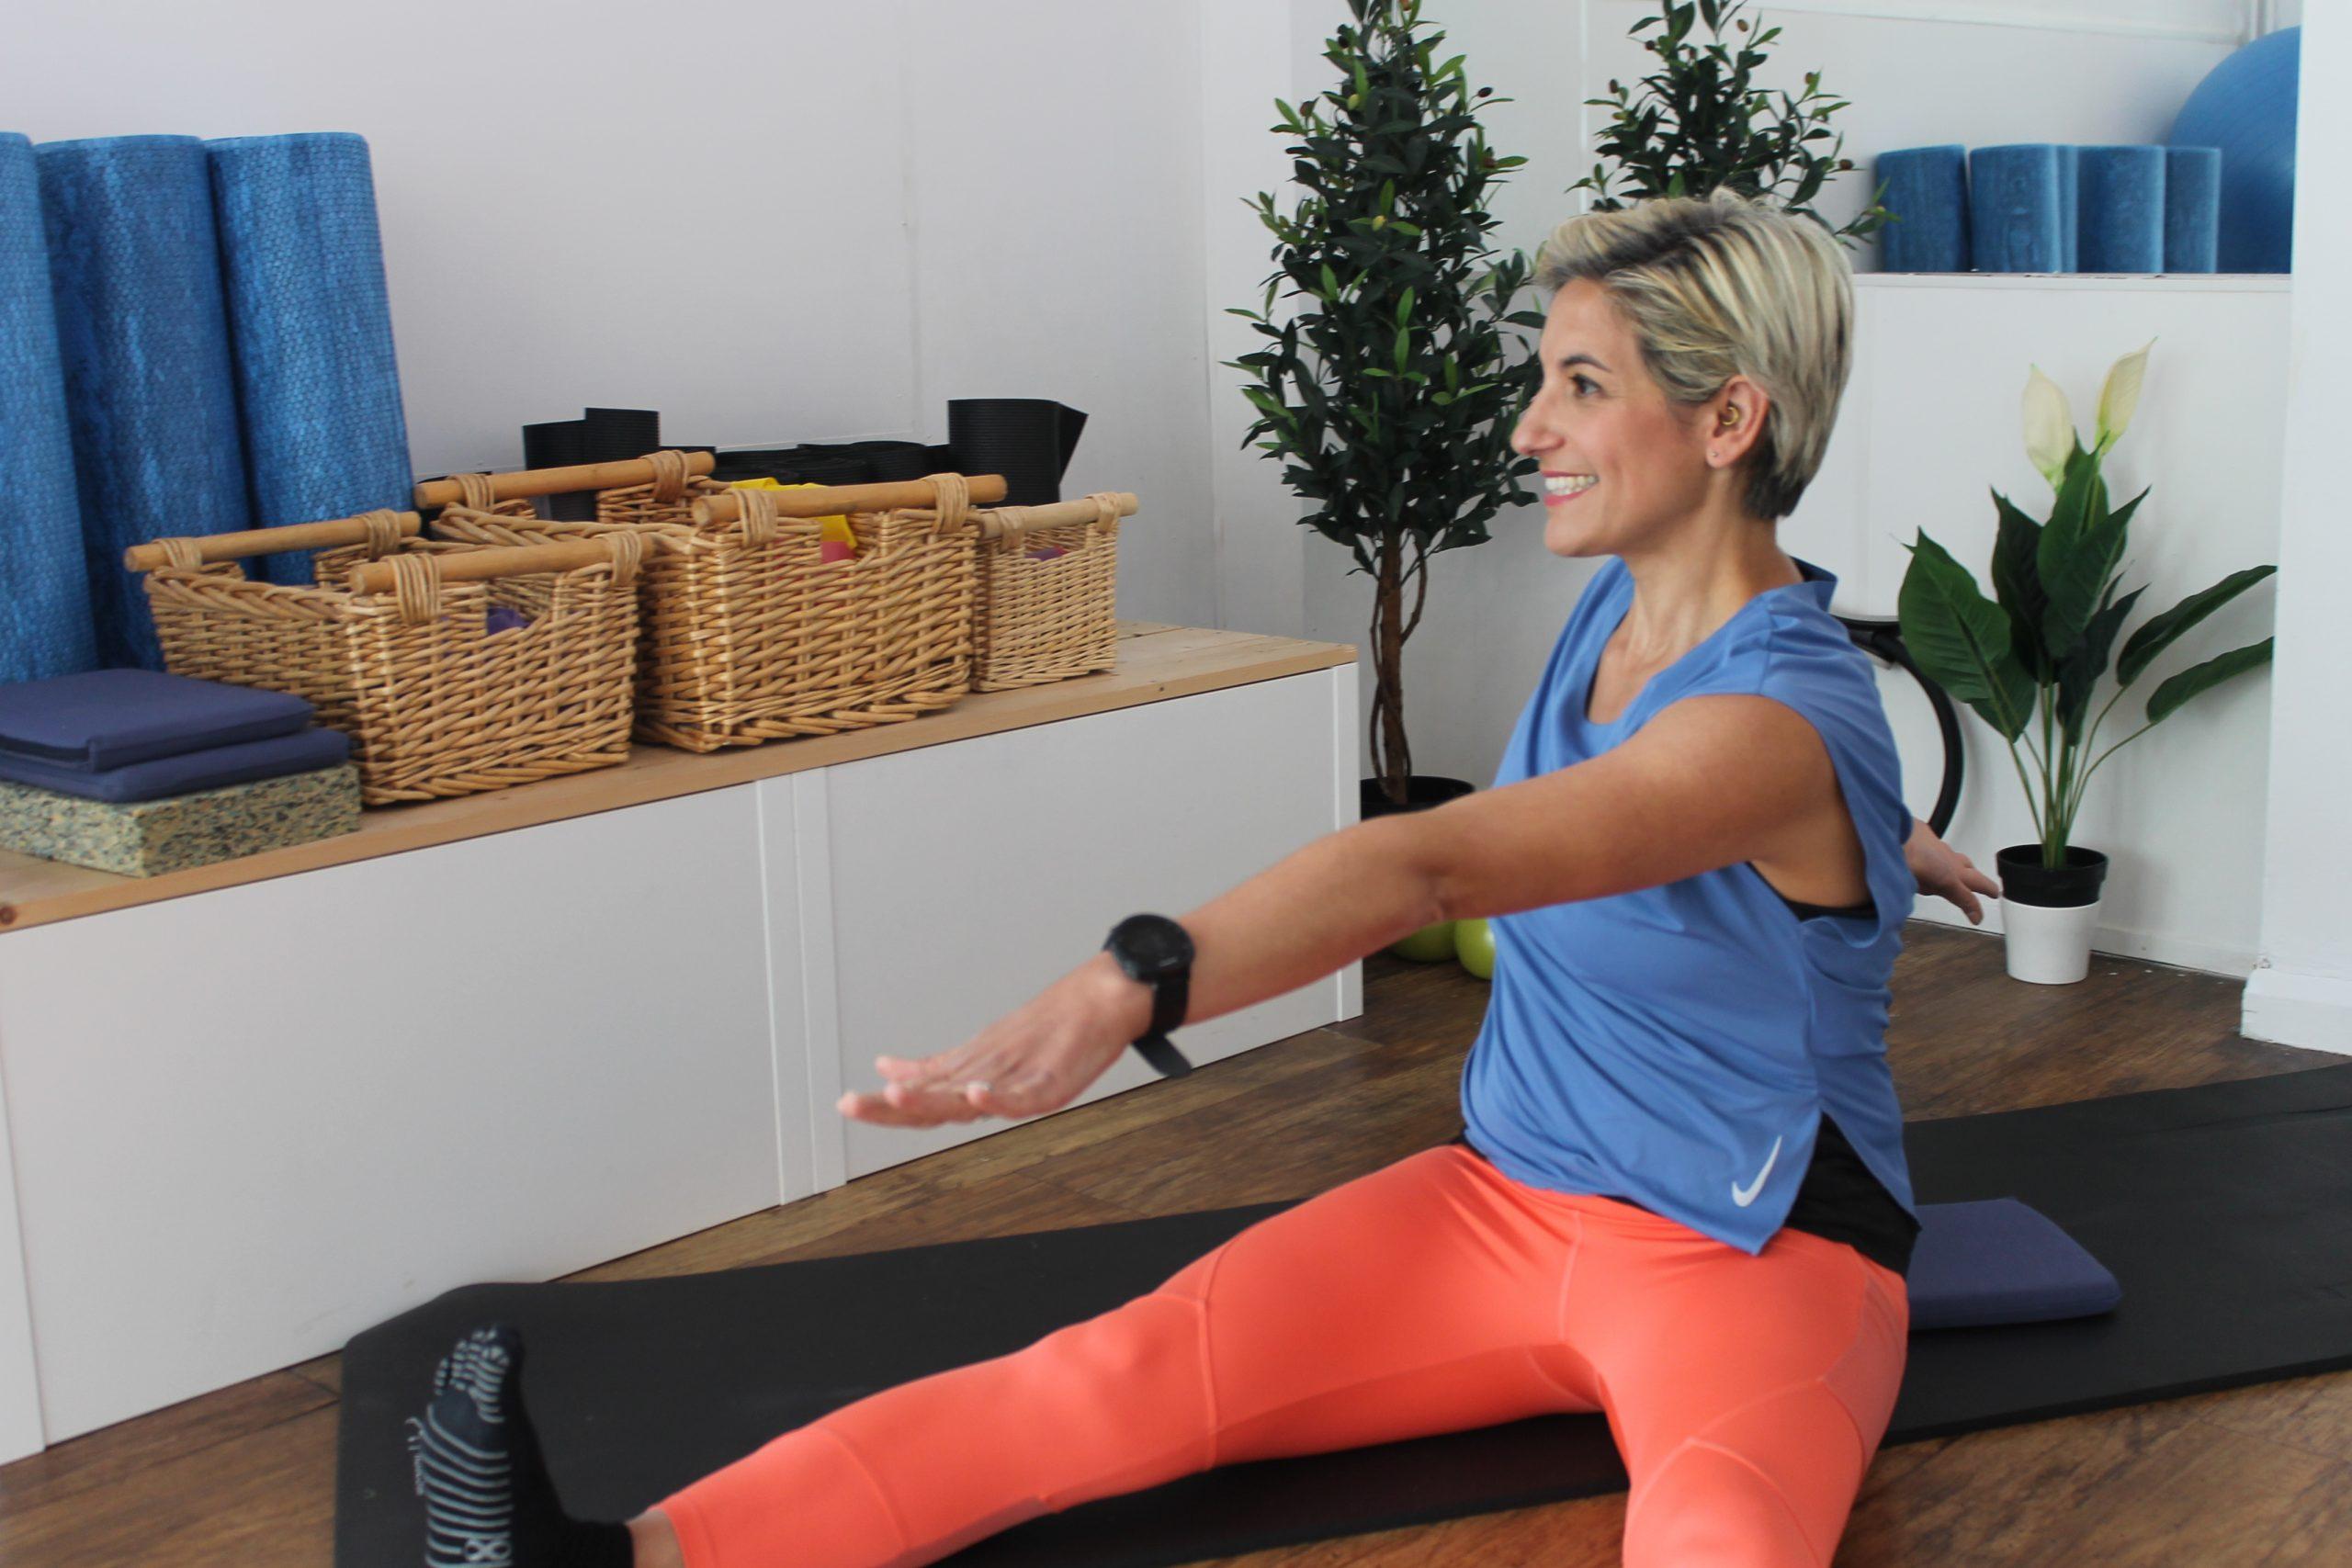 Pilates instructor Anna doing pilates move